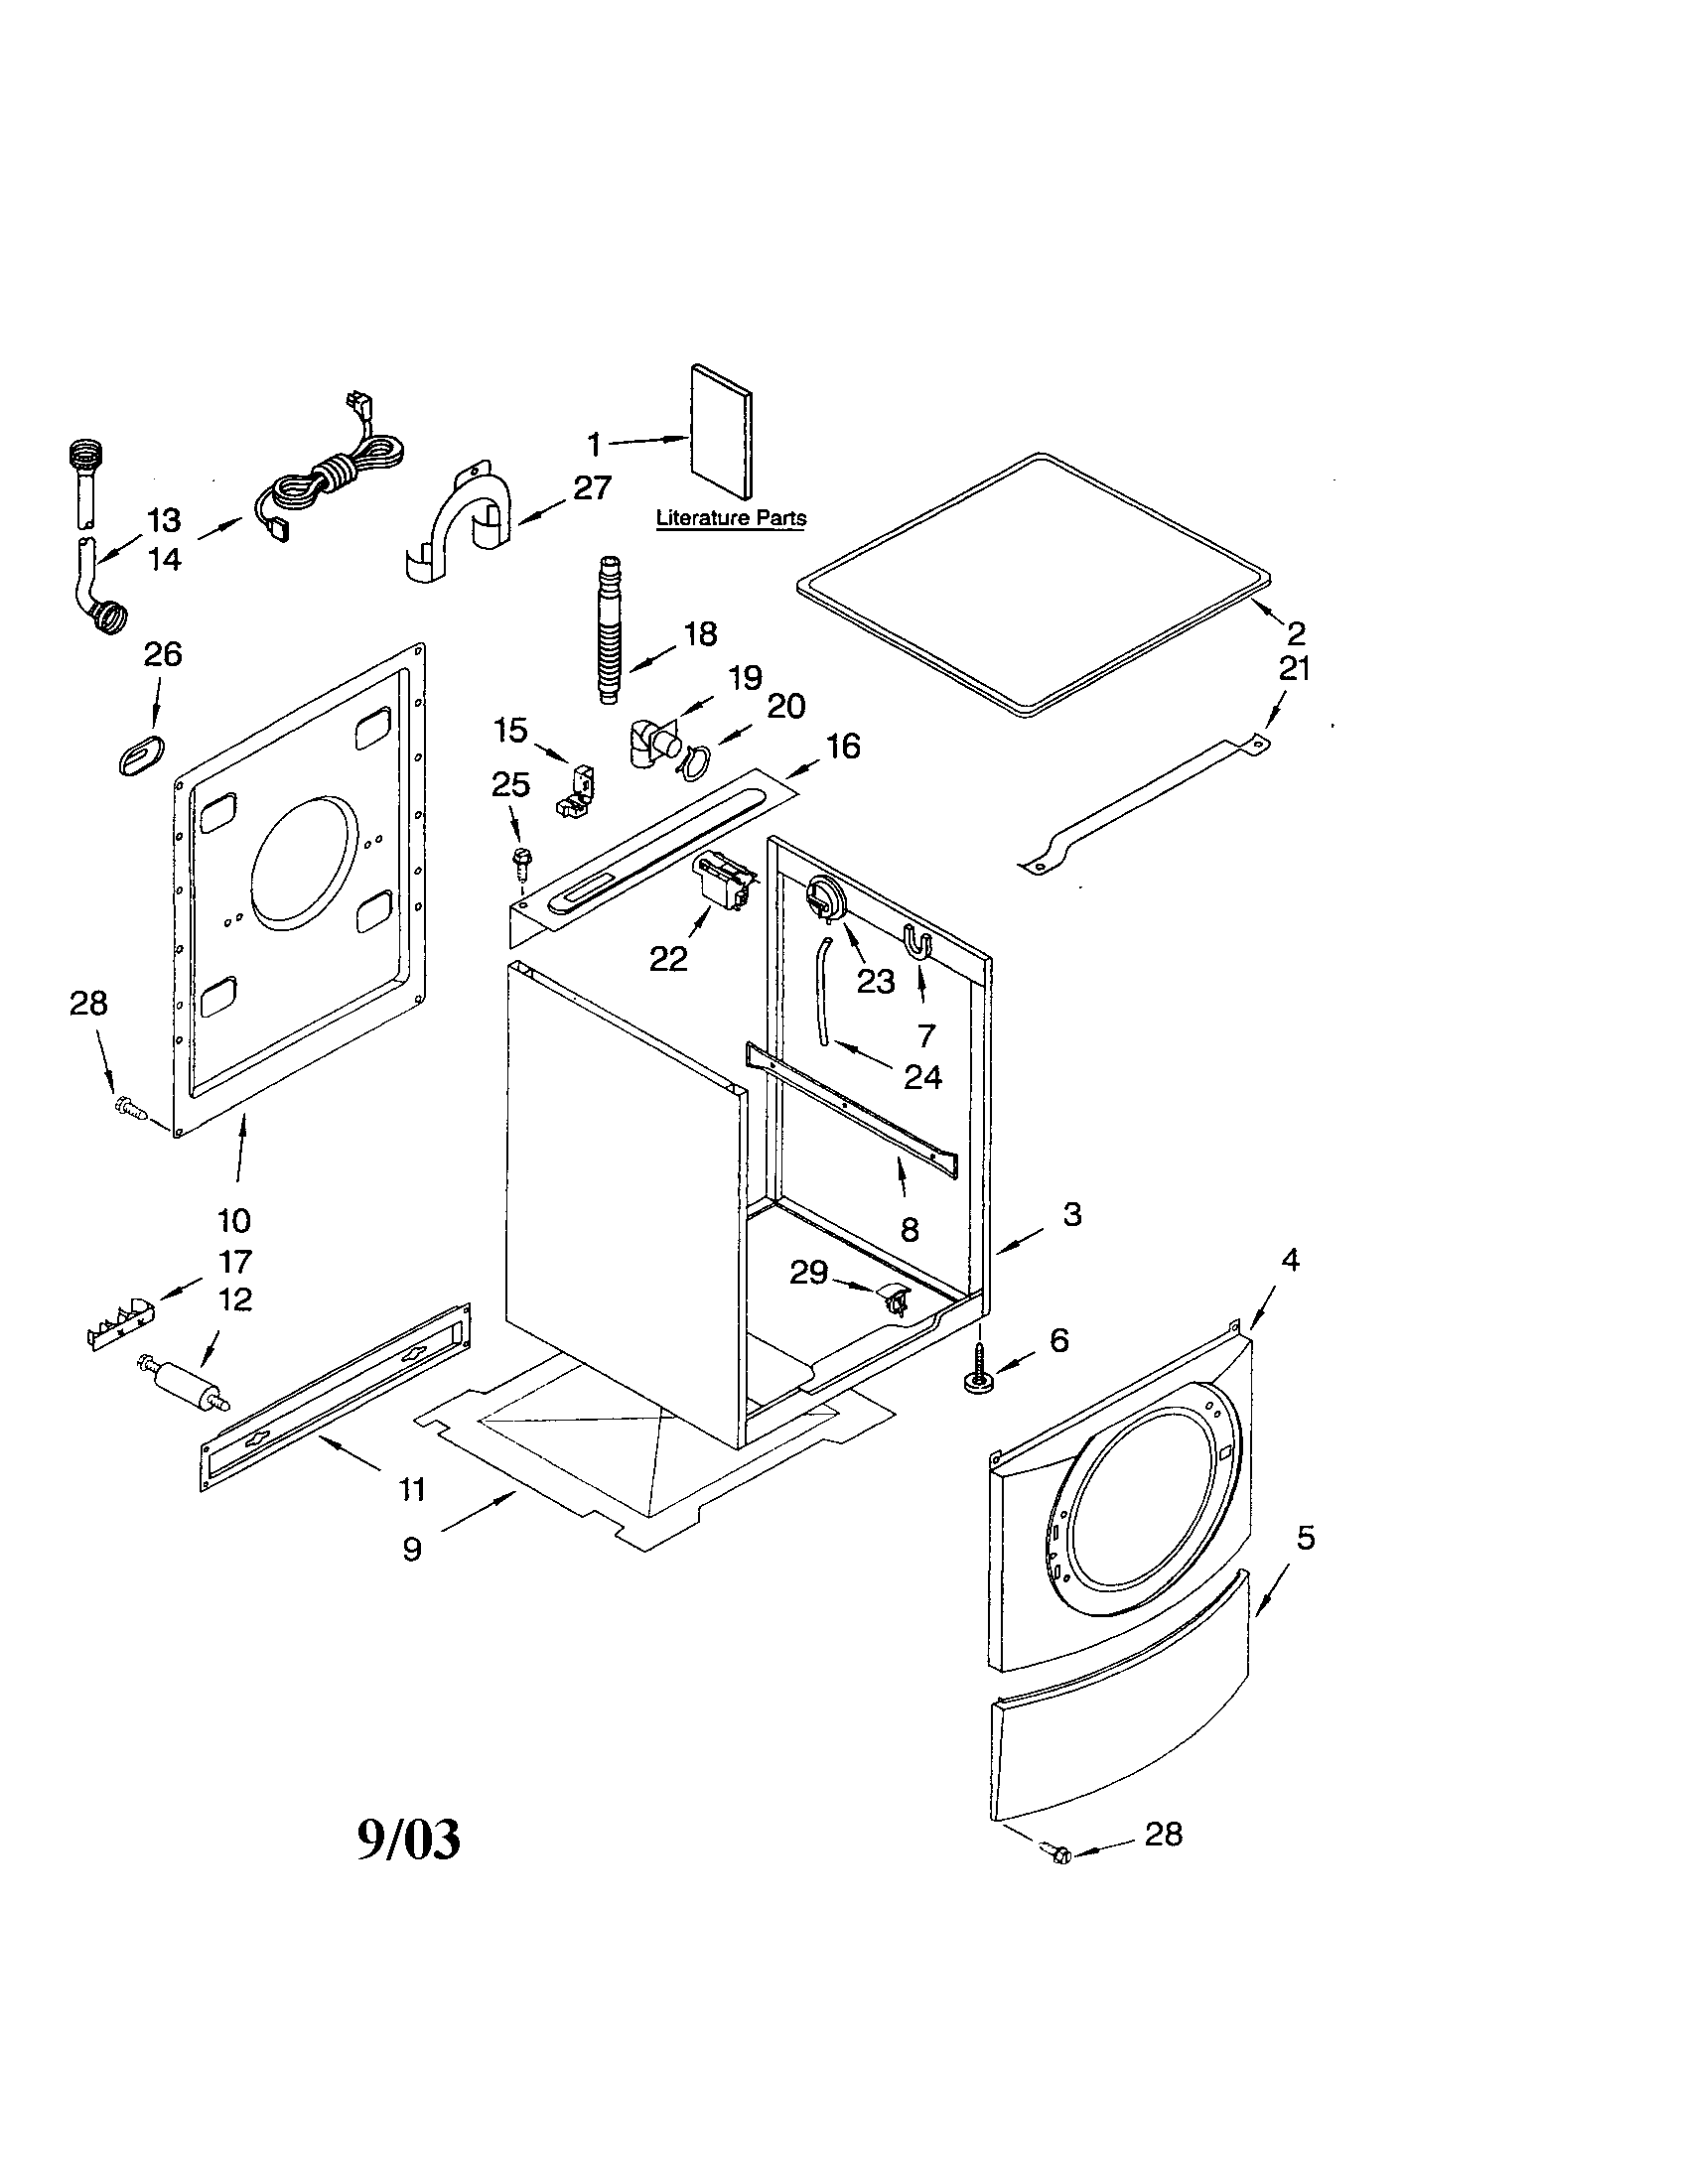 diagram parts list for model 11042922200 kenmoreeliteparts washer wiring diagram today [ 1696 x 2200 Pixel ]